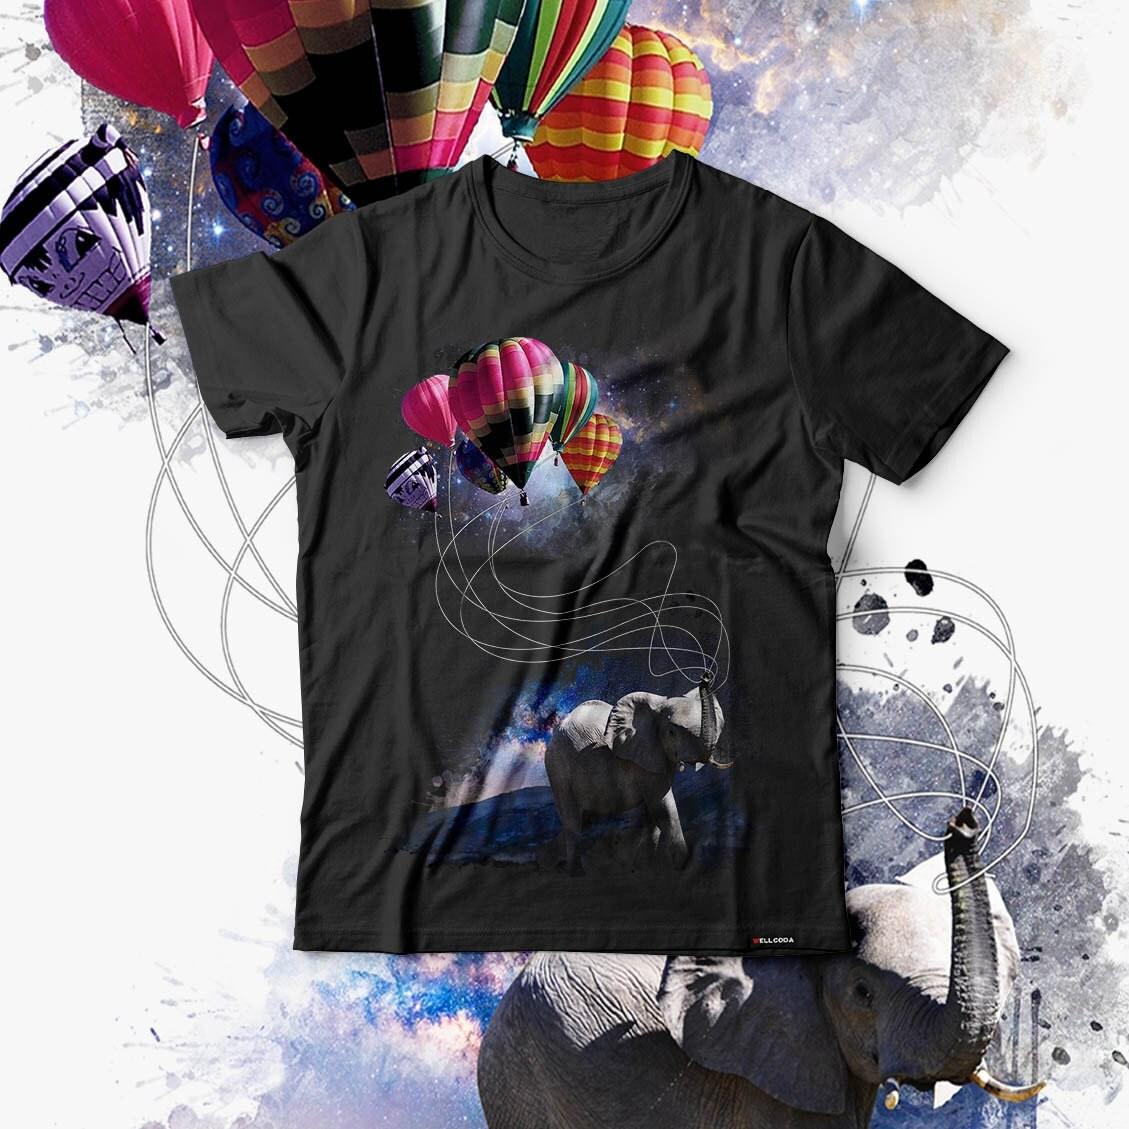 Dreaming Elephant Animal Dream Men Black Tshirt S5XL NEW  Wellcoda